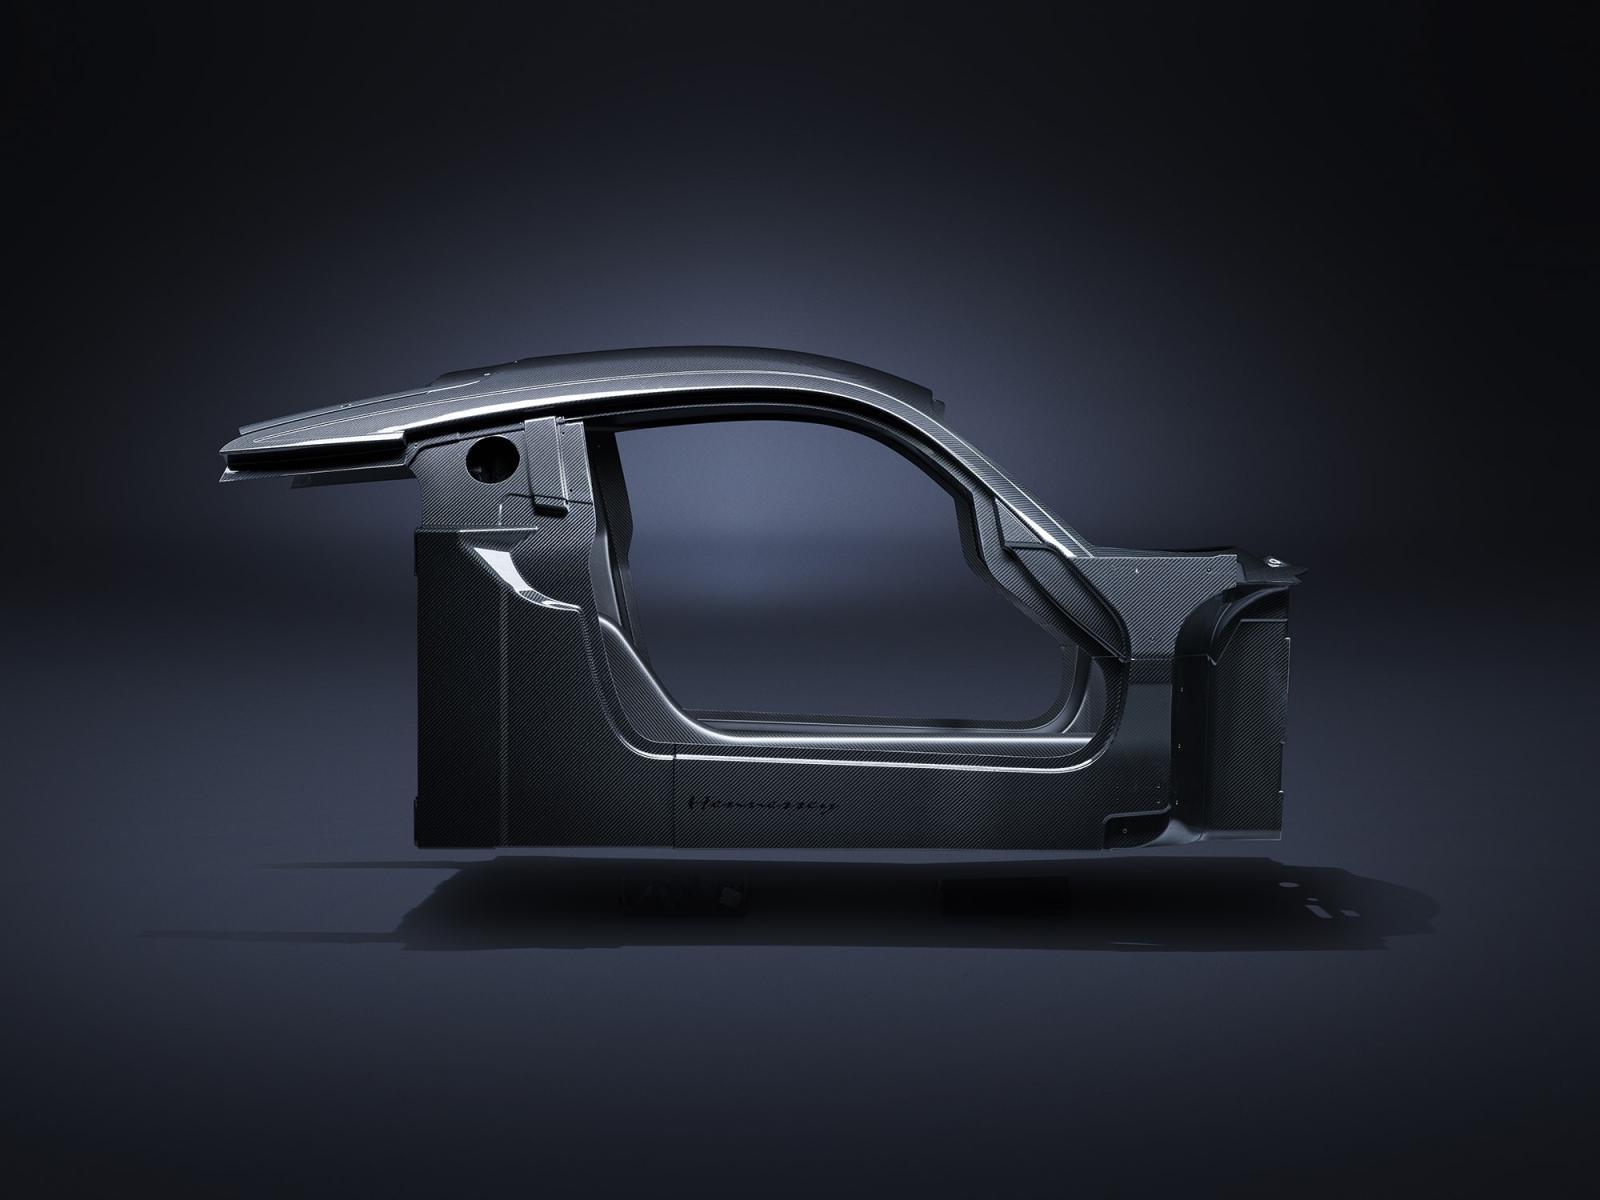 Hennessey Venom F5 chasis